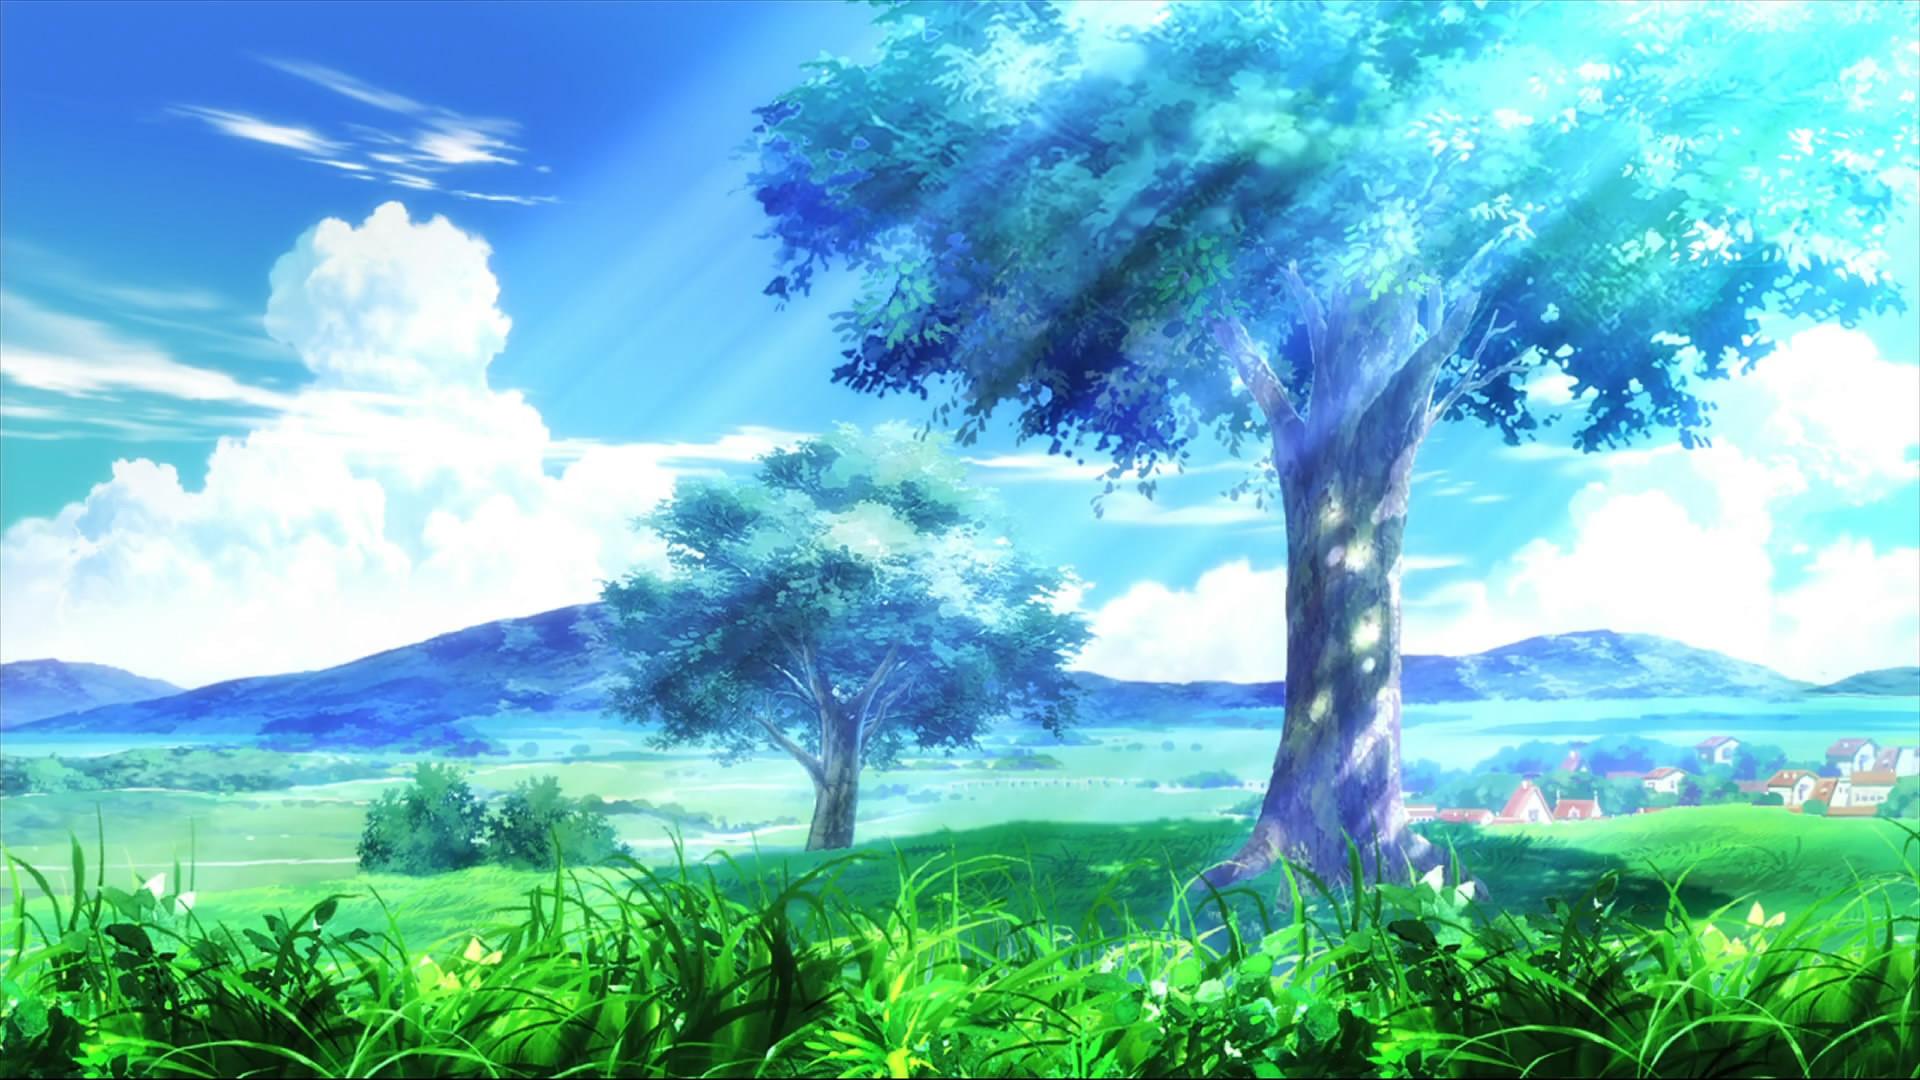 Anime Scenery Desktop Background   Wallmeta.com